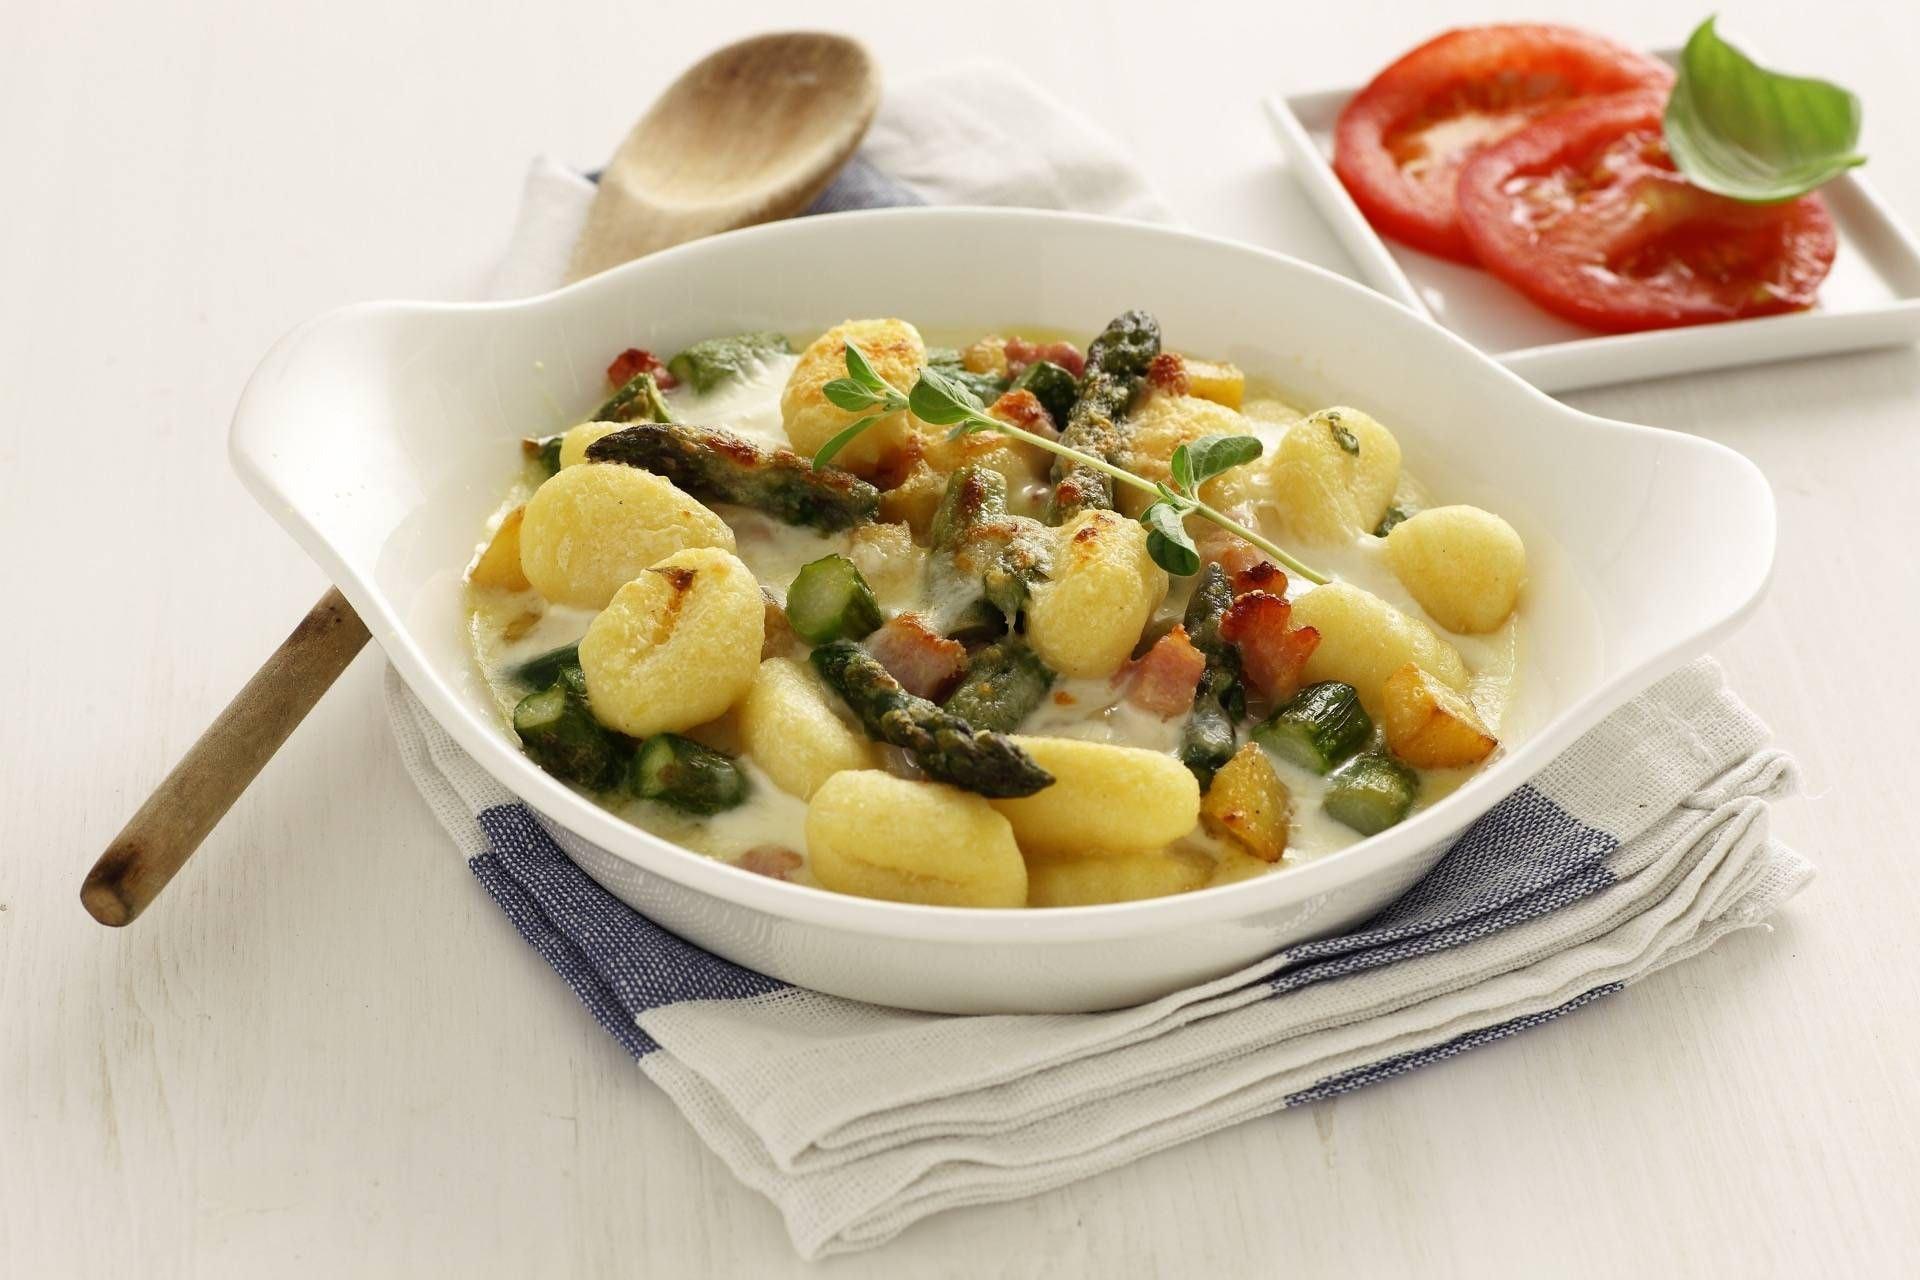 Gnocchi asparagi e pancetta - Parmalat